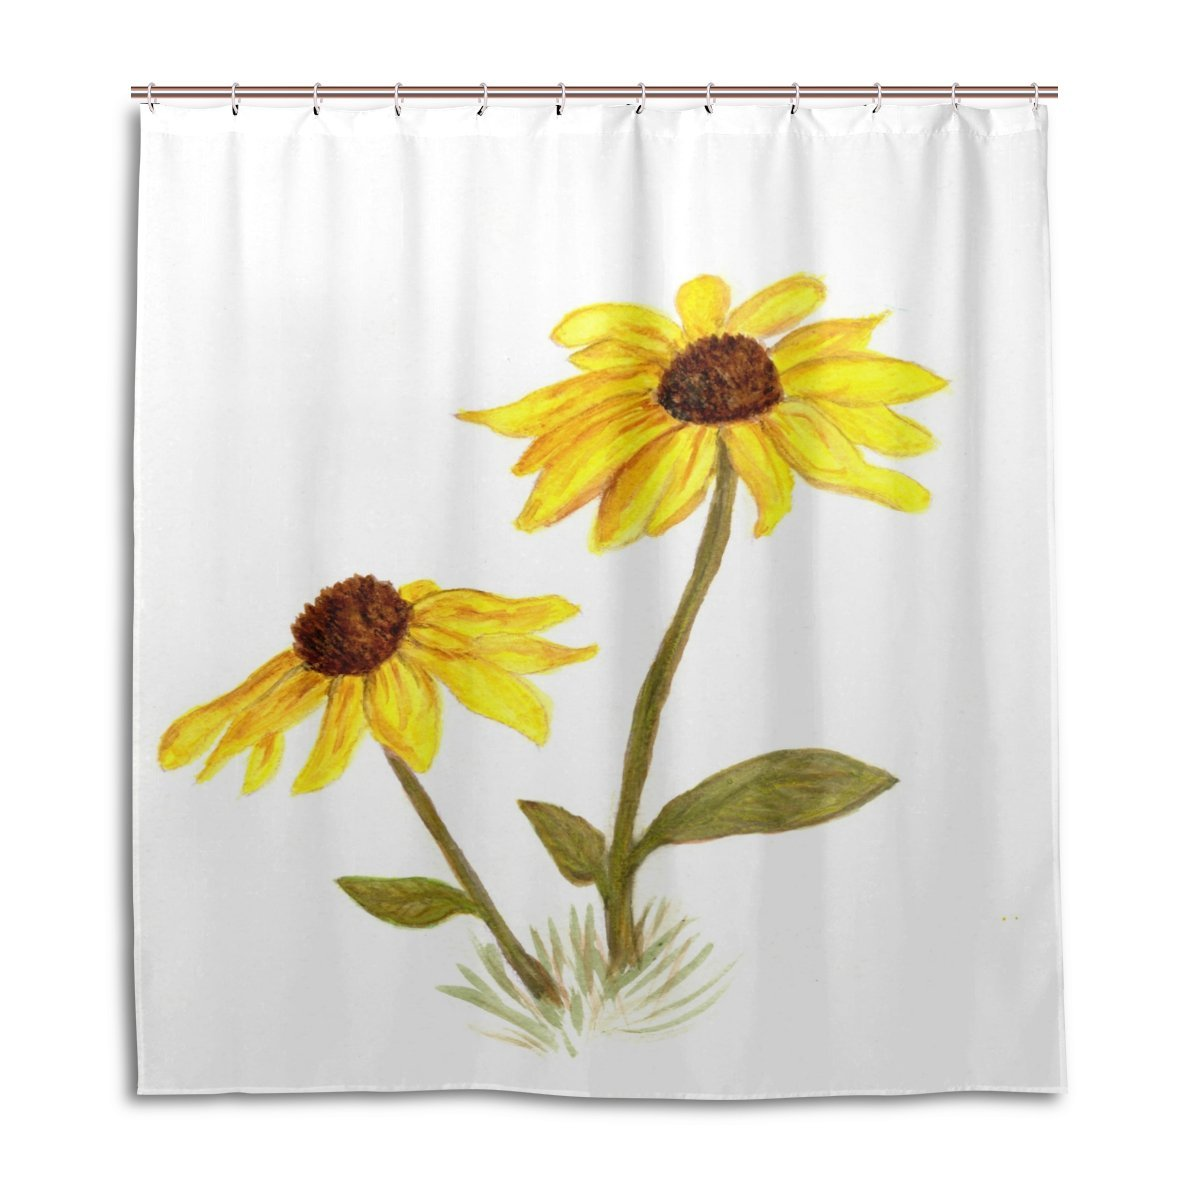 POPCreation Chrysanthemum Shower Curtain Waterproof Bathroom Shower Curtain 60x72 inches